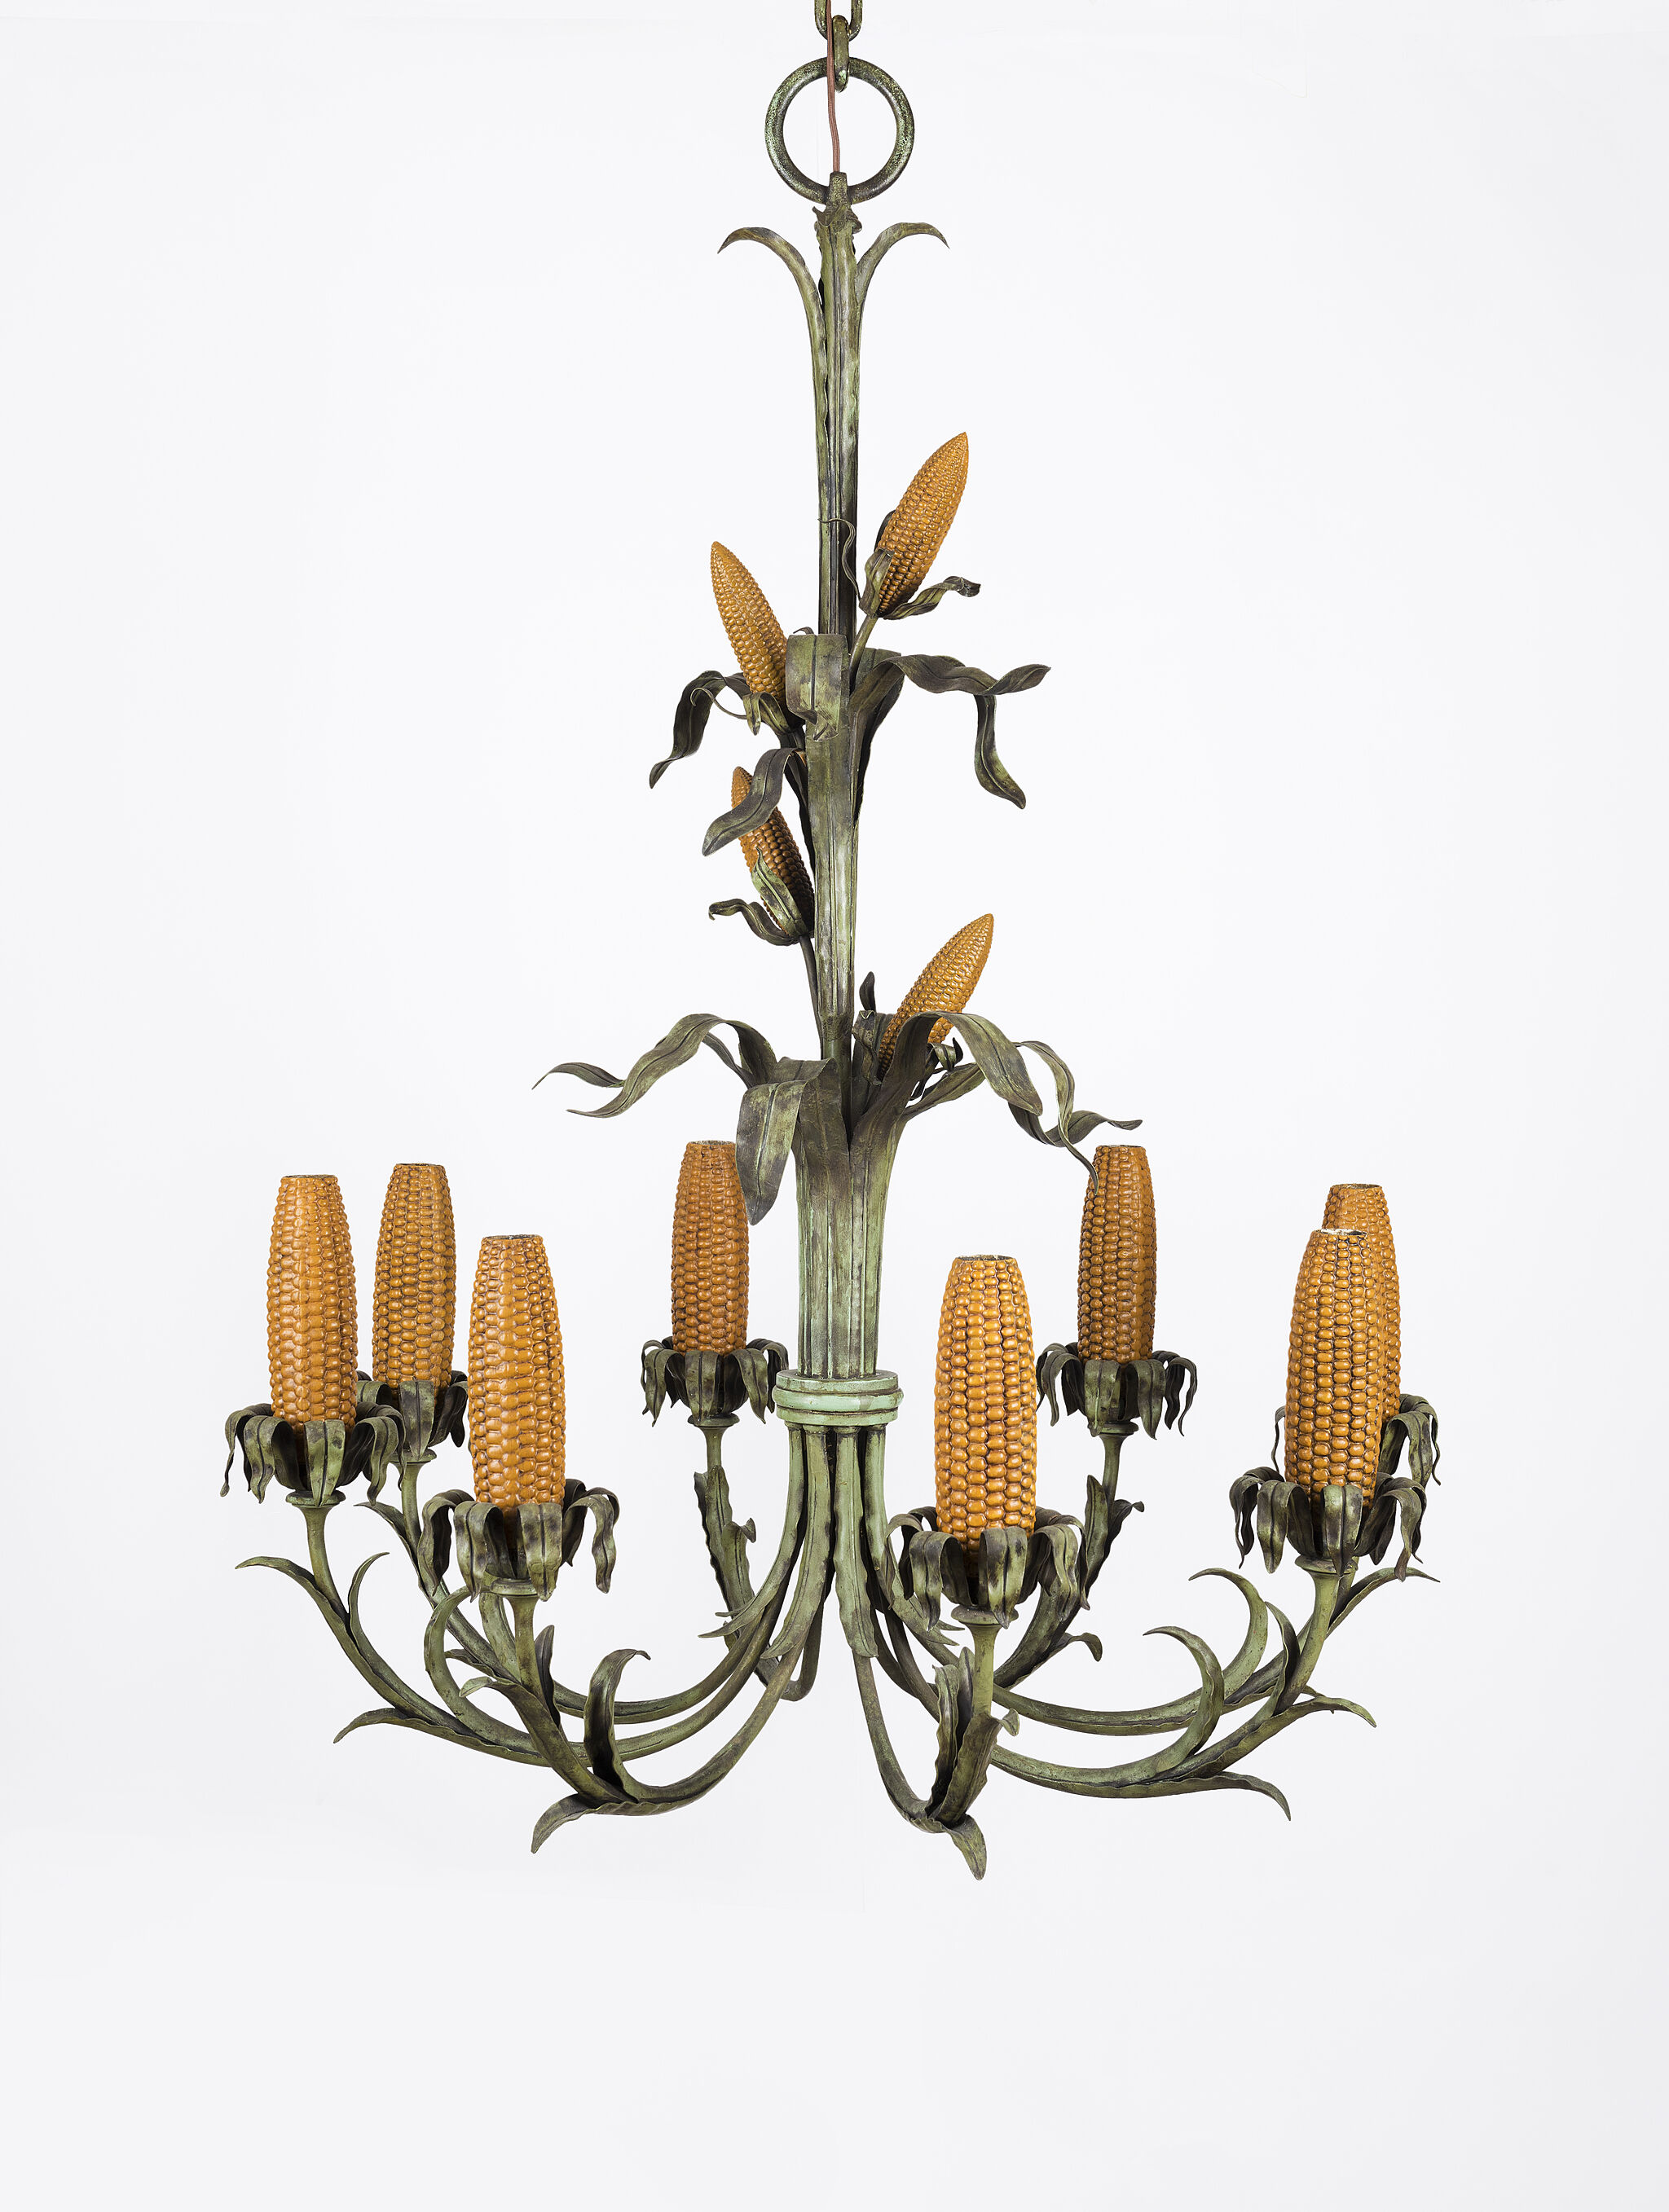 Chandelier Sculpture made from Corn Cobb